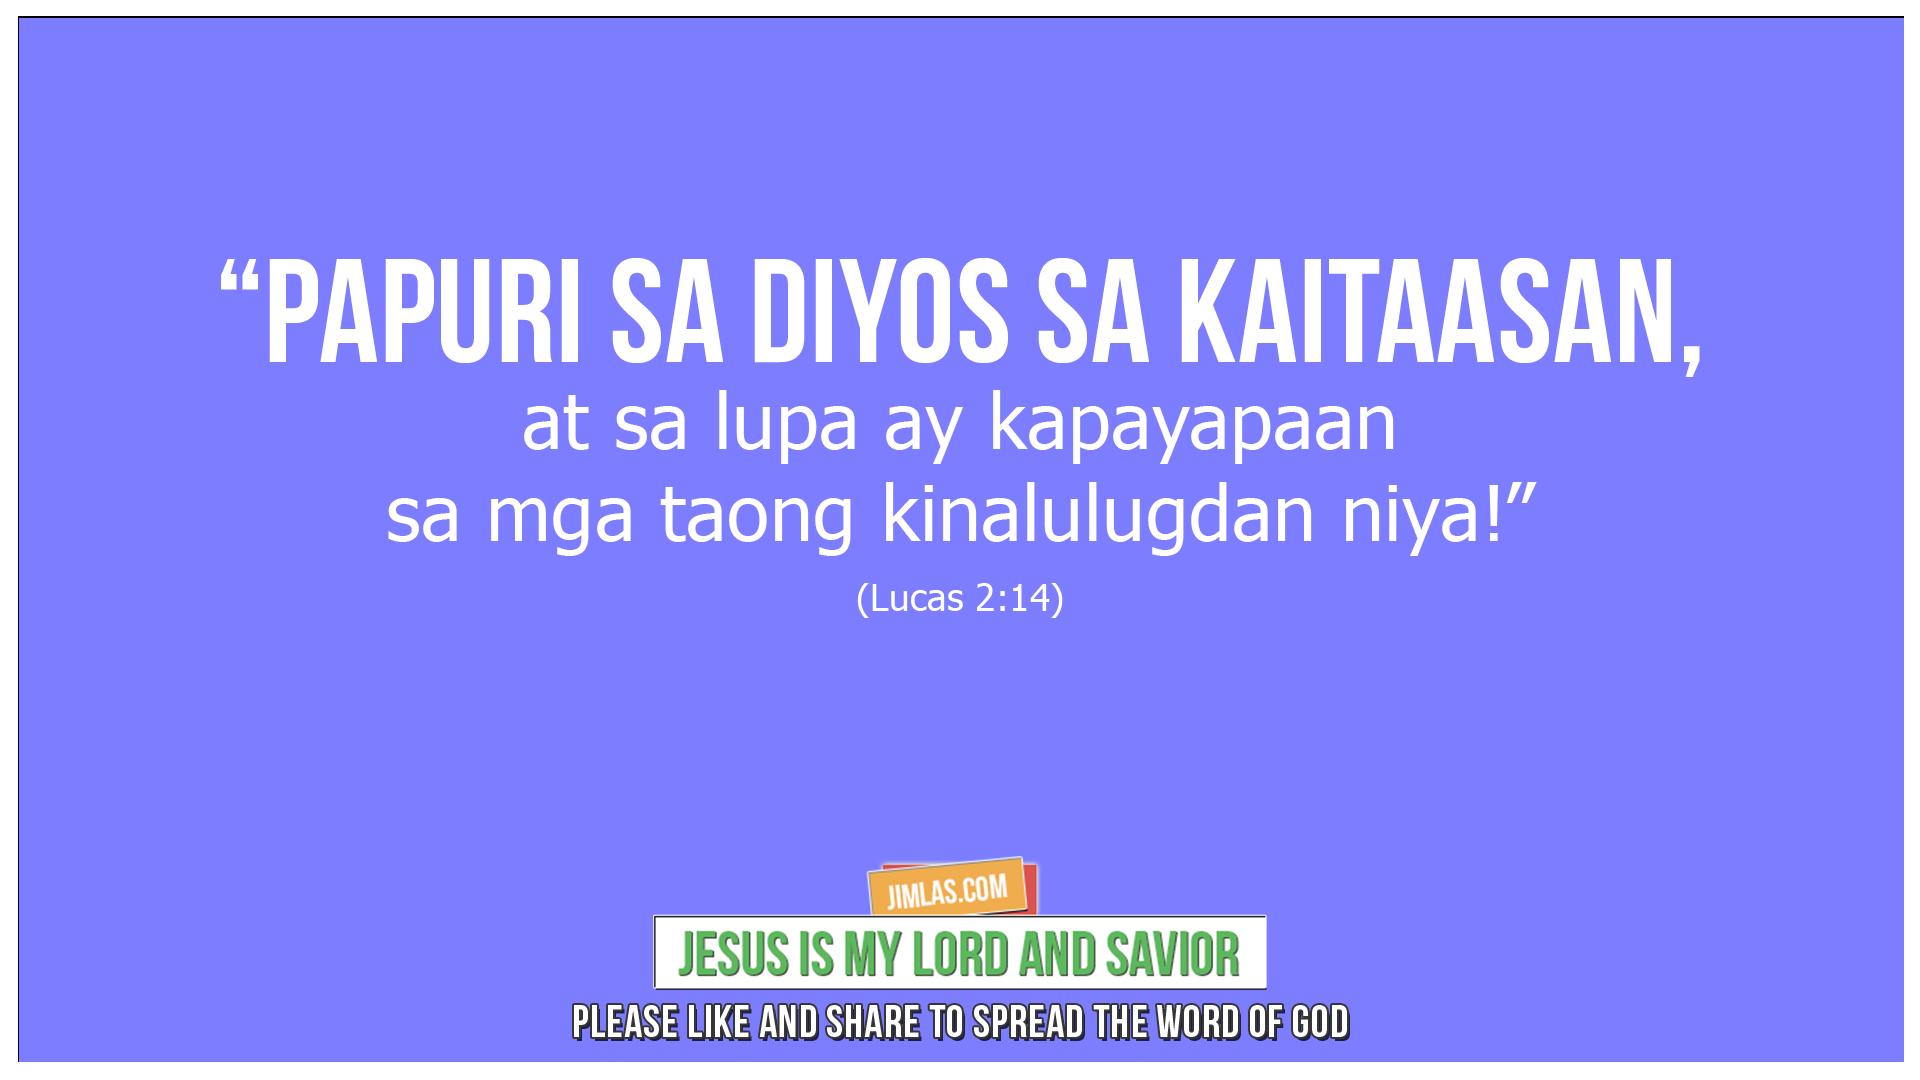 lucas 2 14, Lucas 2:14